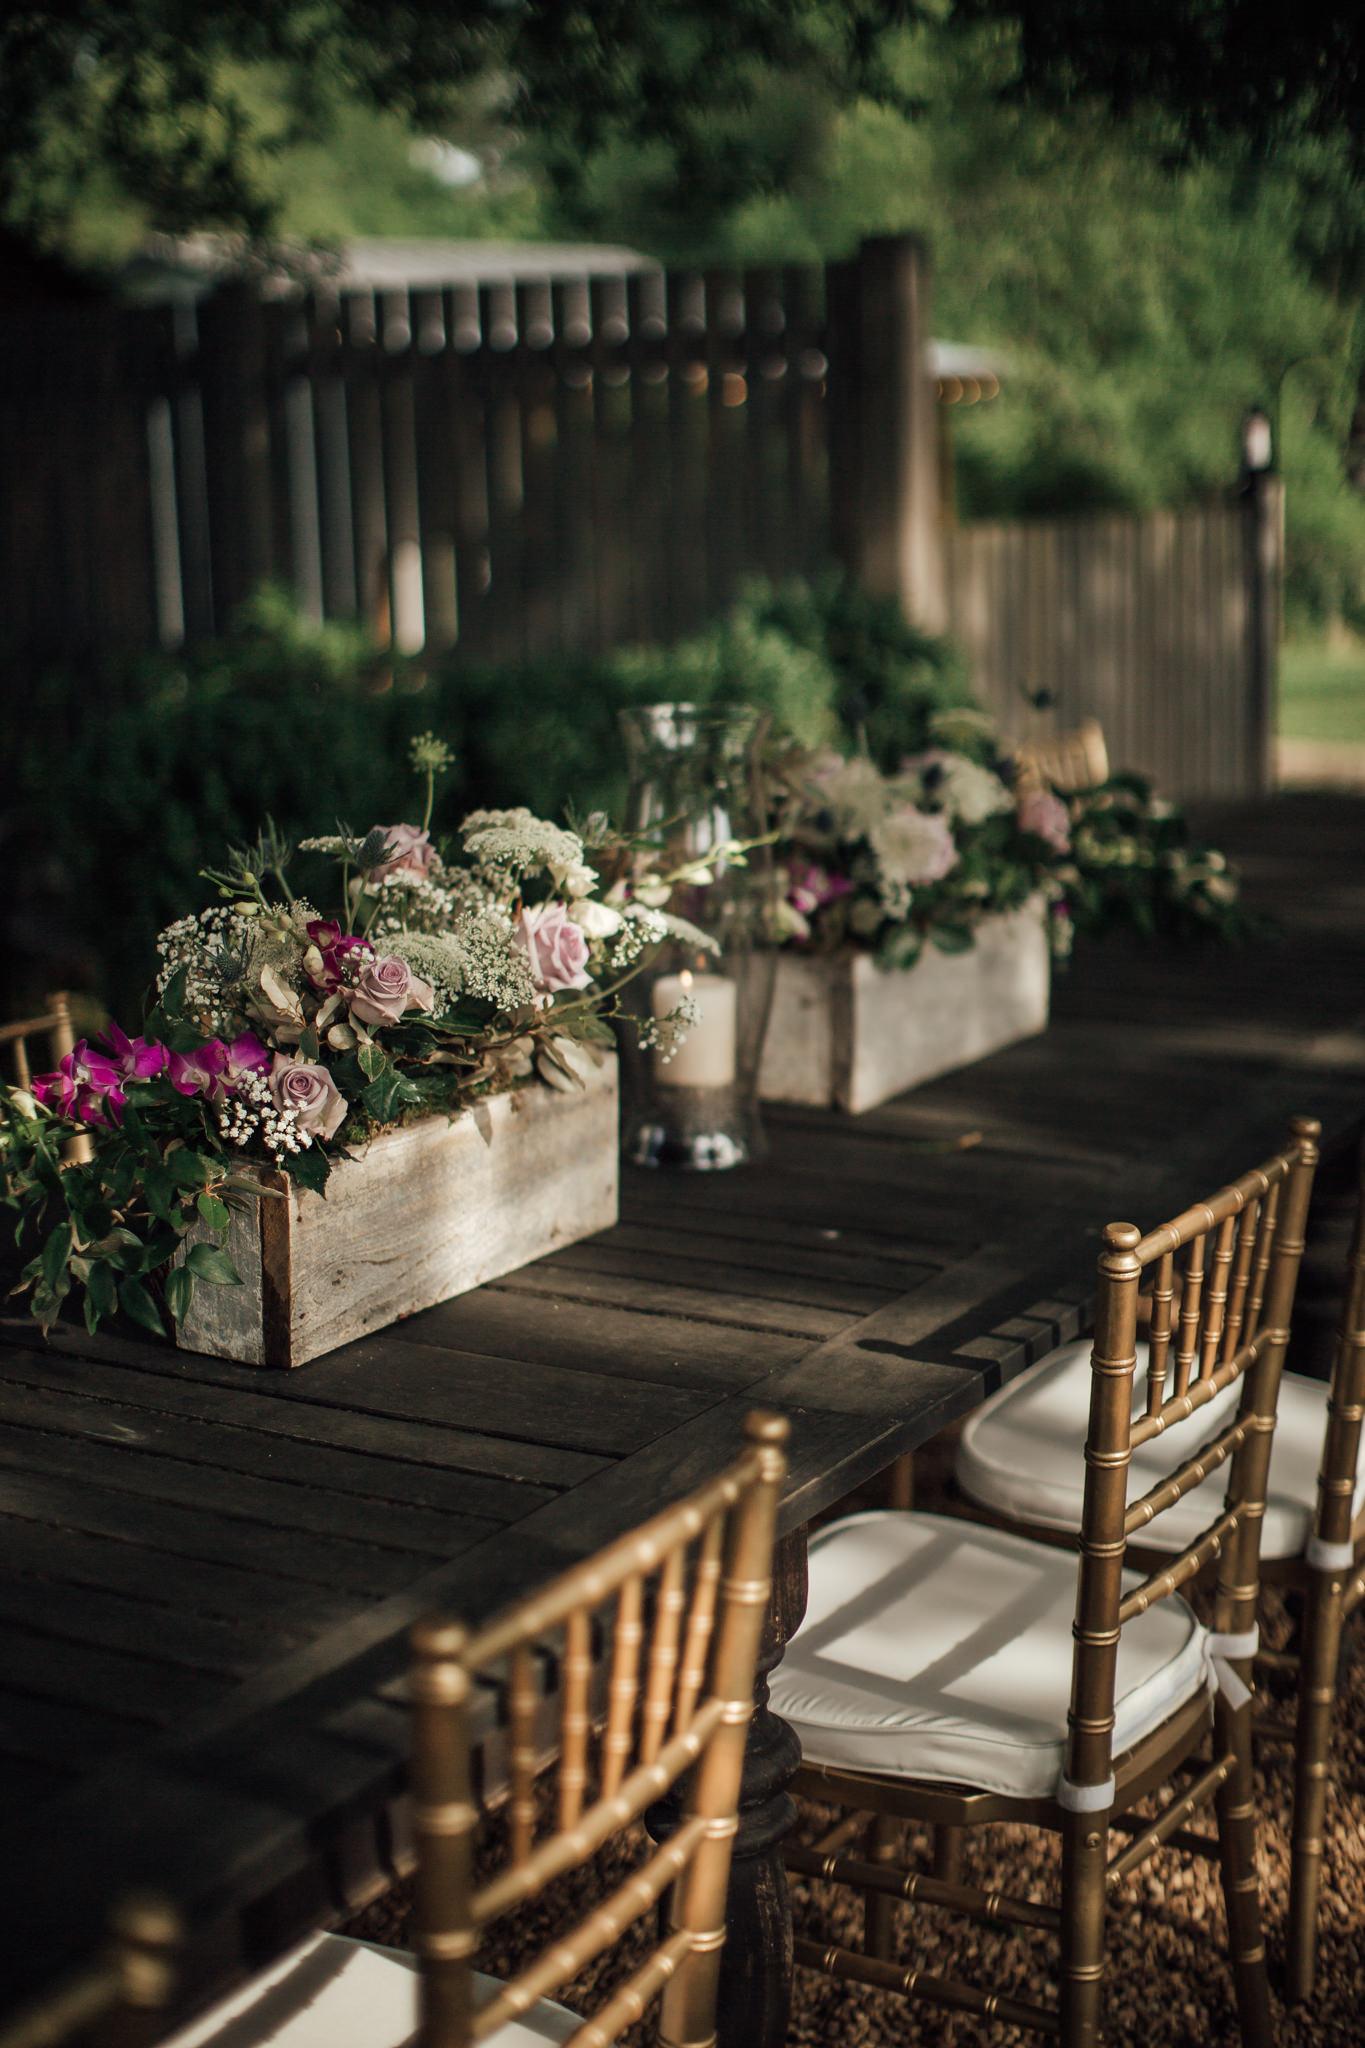 cassie-cook-photography-memphis-wedding-photographer-hedge-farm-wedding-venue-122.jpg